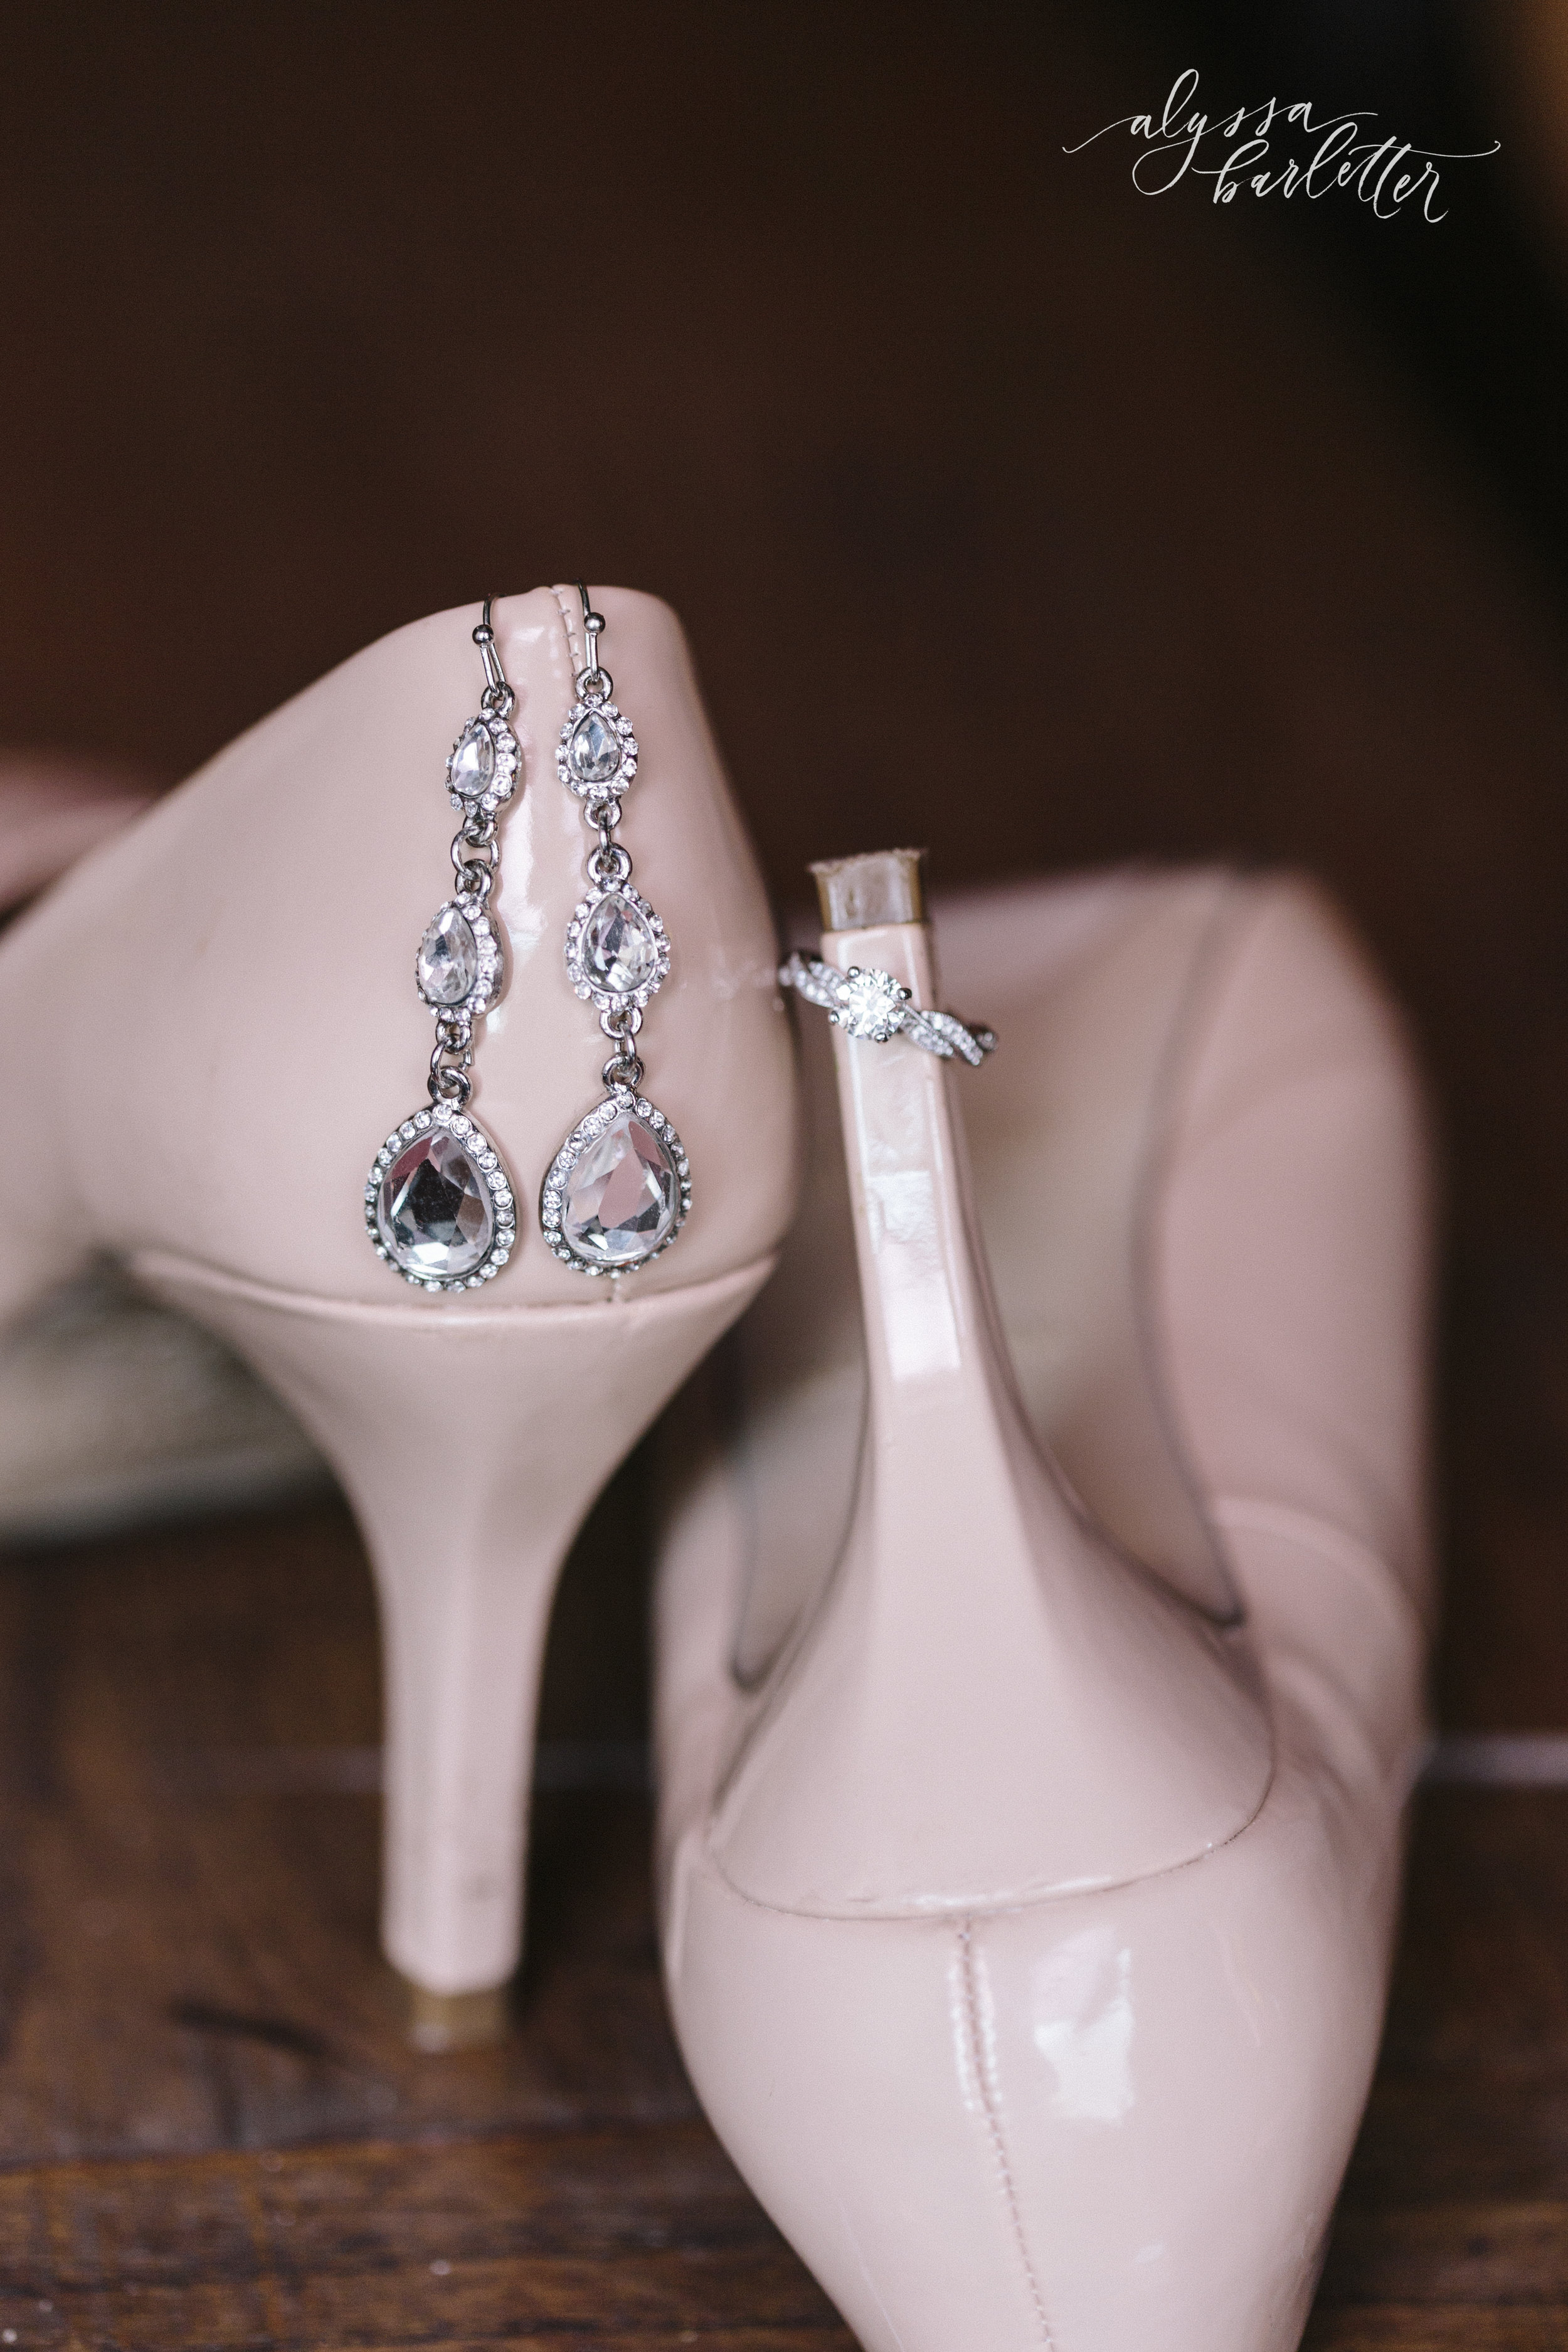 kansas city wedding photographer redeemer midtown details shoes jewelry earrings bride